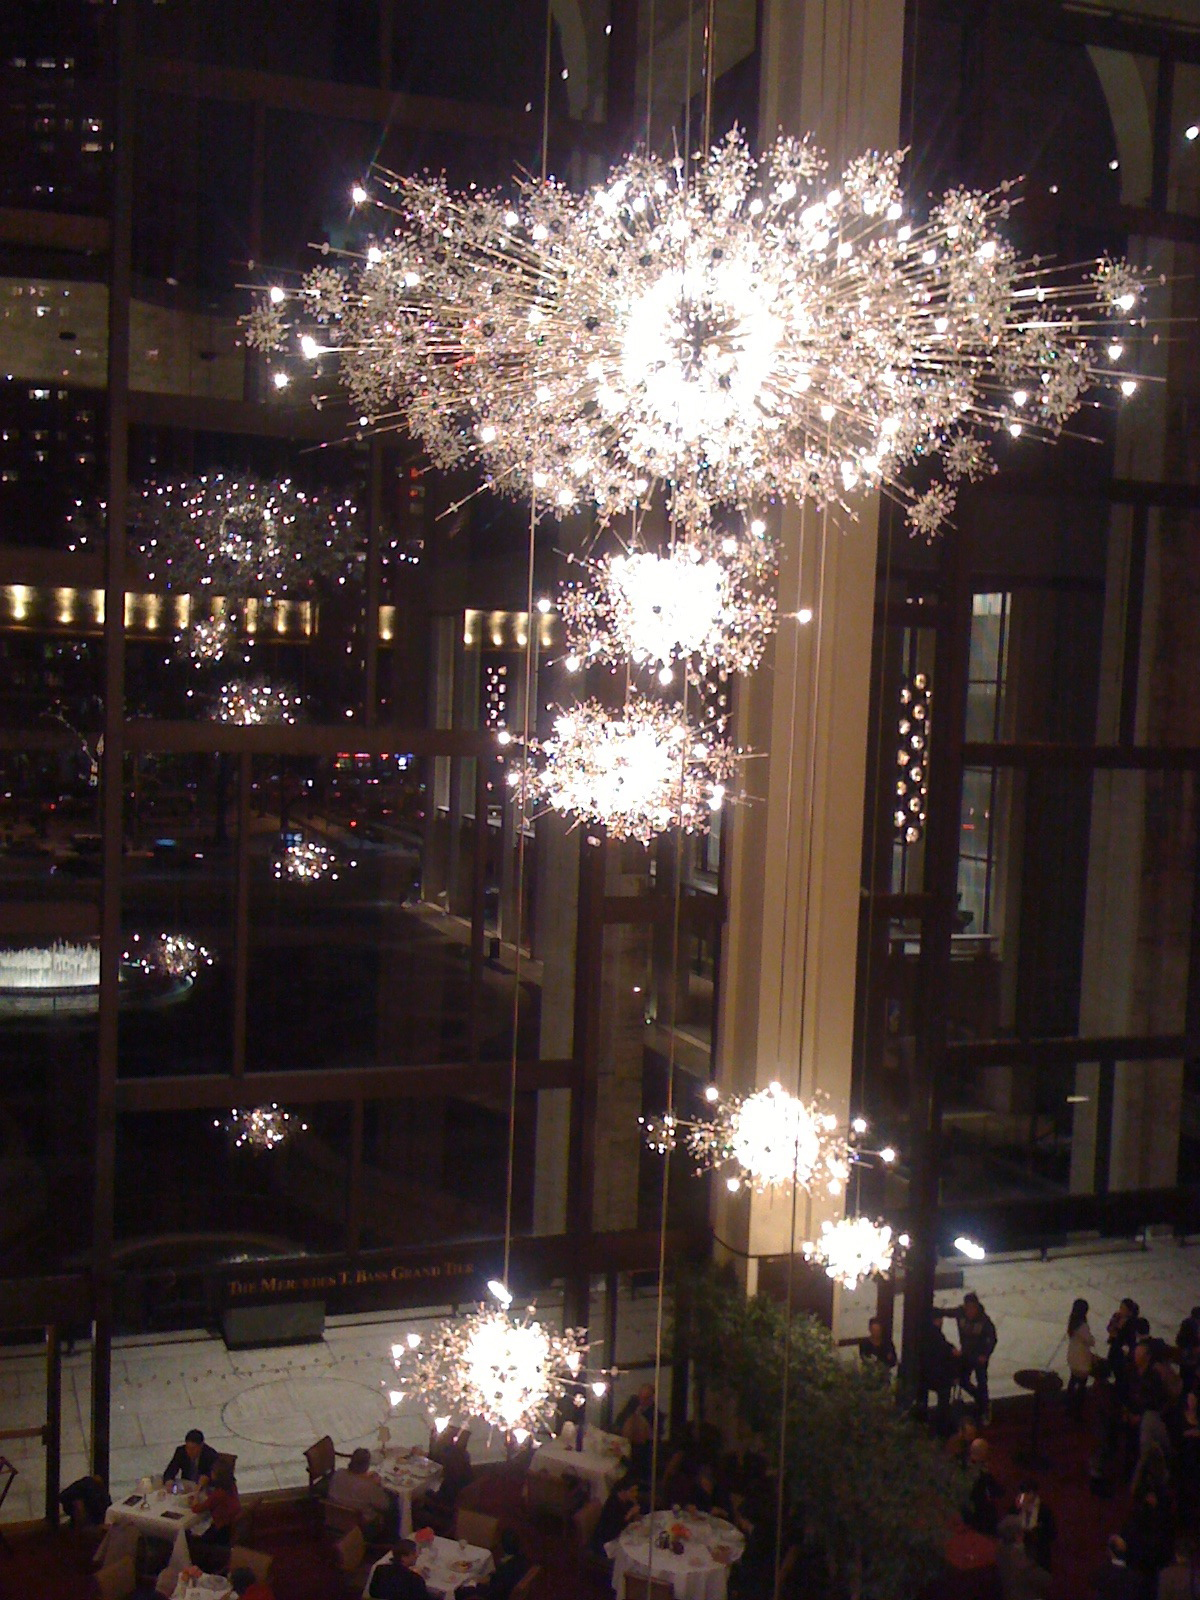 Filenew york city metropolitan opera lincoln center lobby filenew york city metropolitan opera lincoln center lobby chandelier g aloadofball Gallery